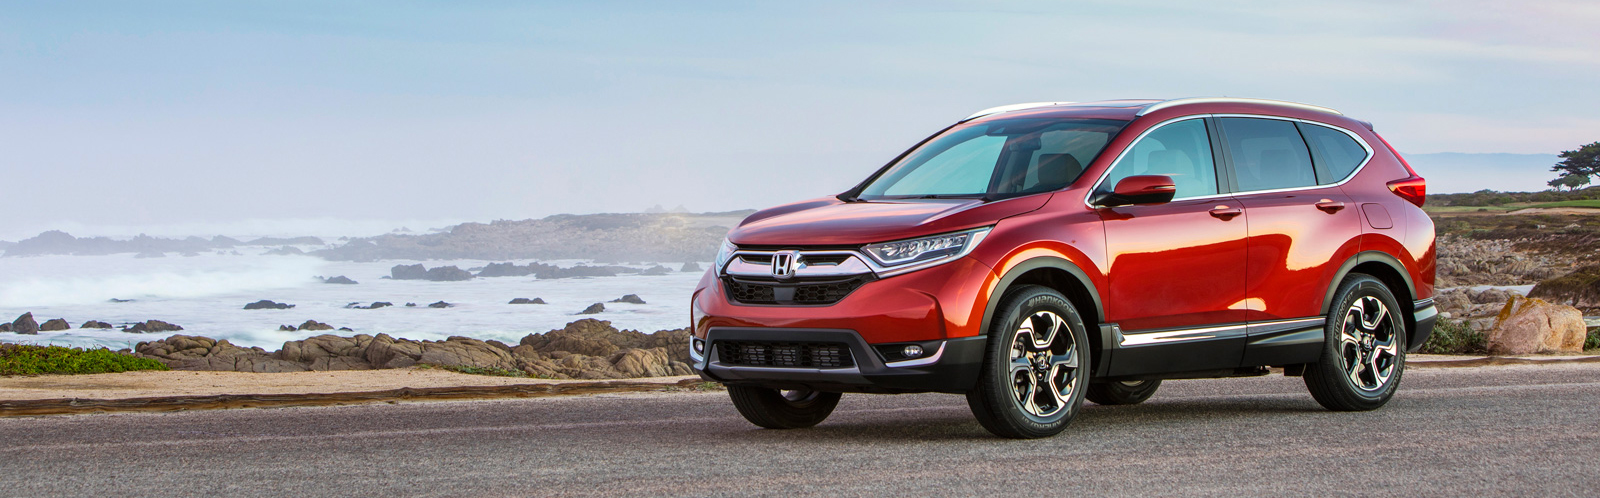 Honda Of Fort Worth 2020 Top Car Models